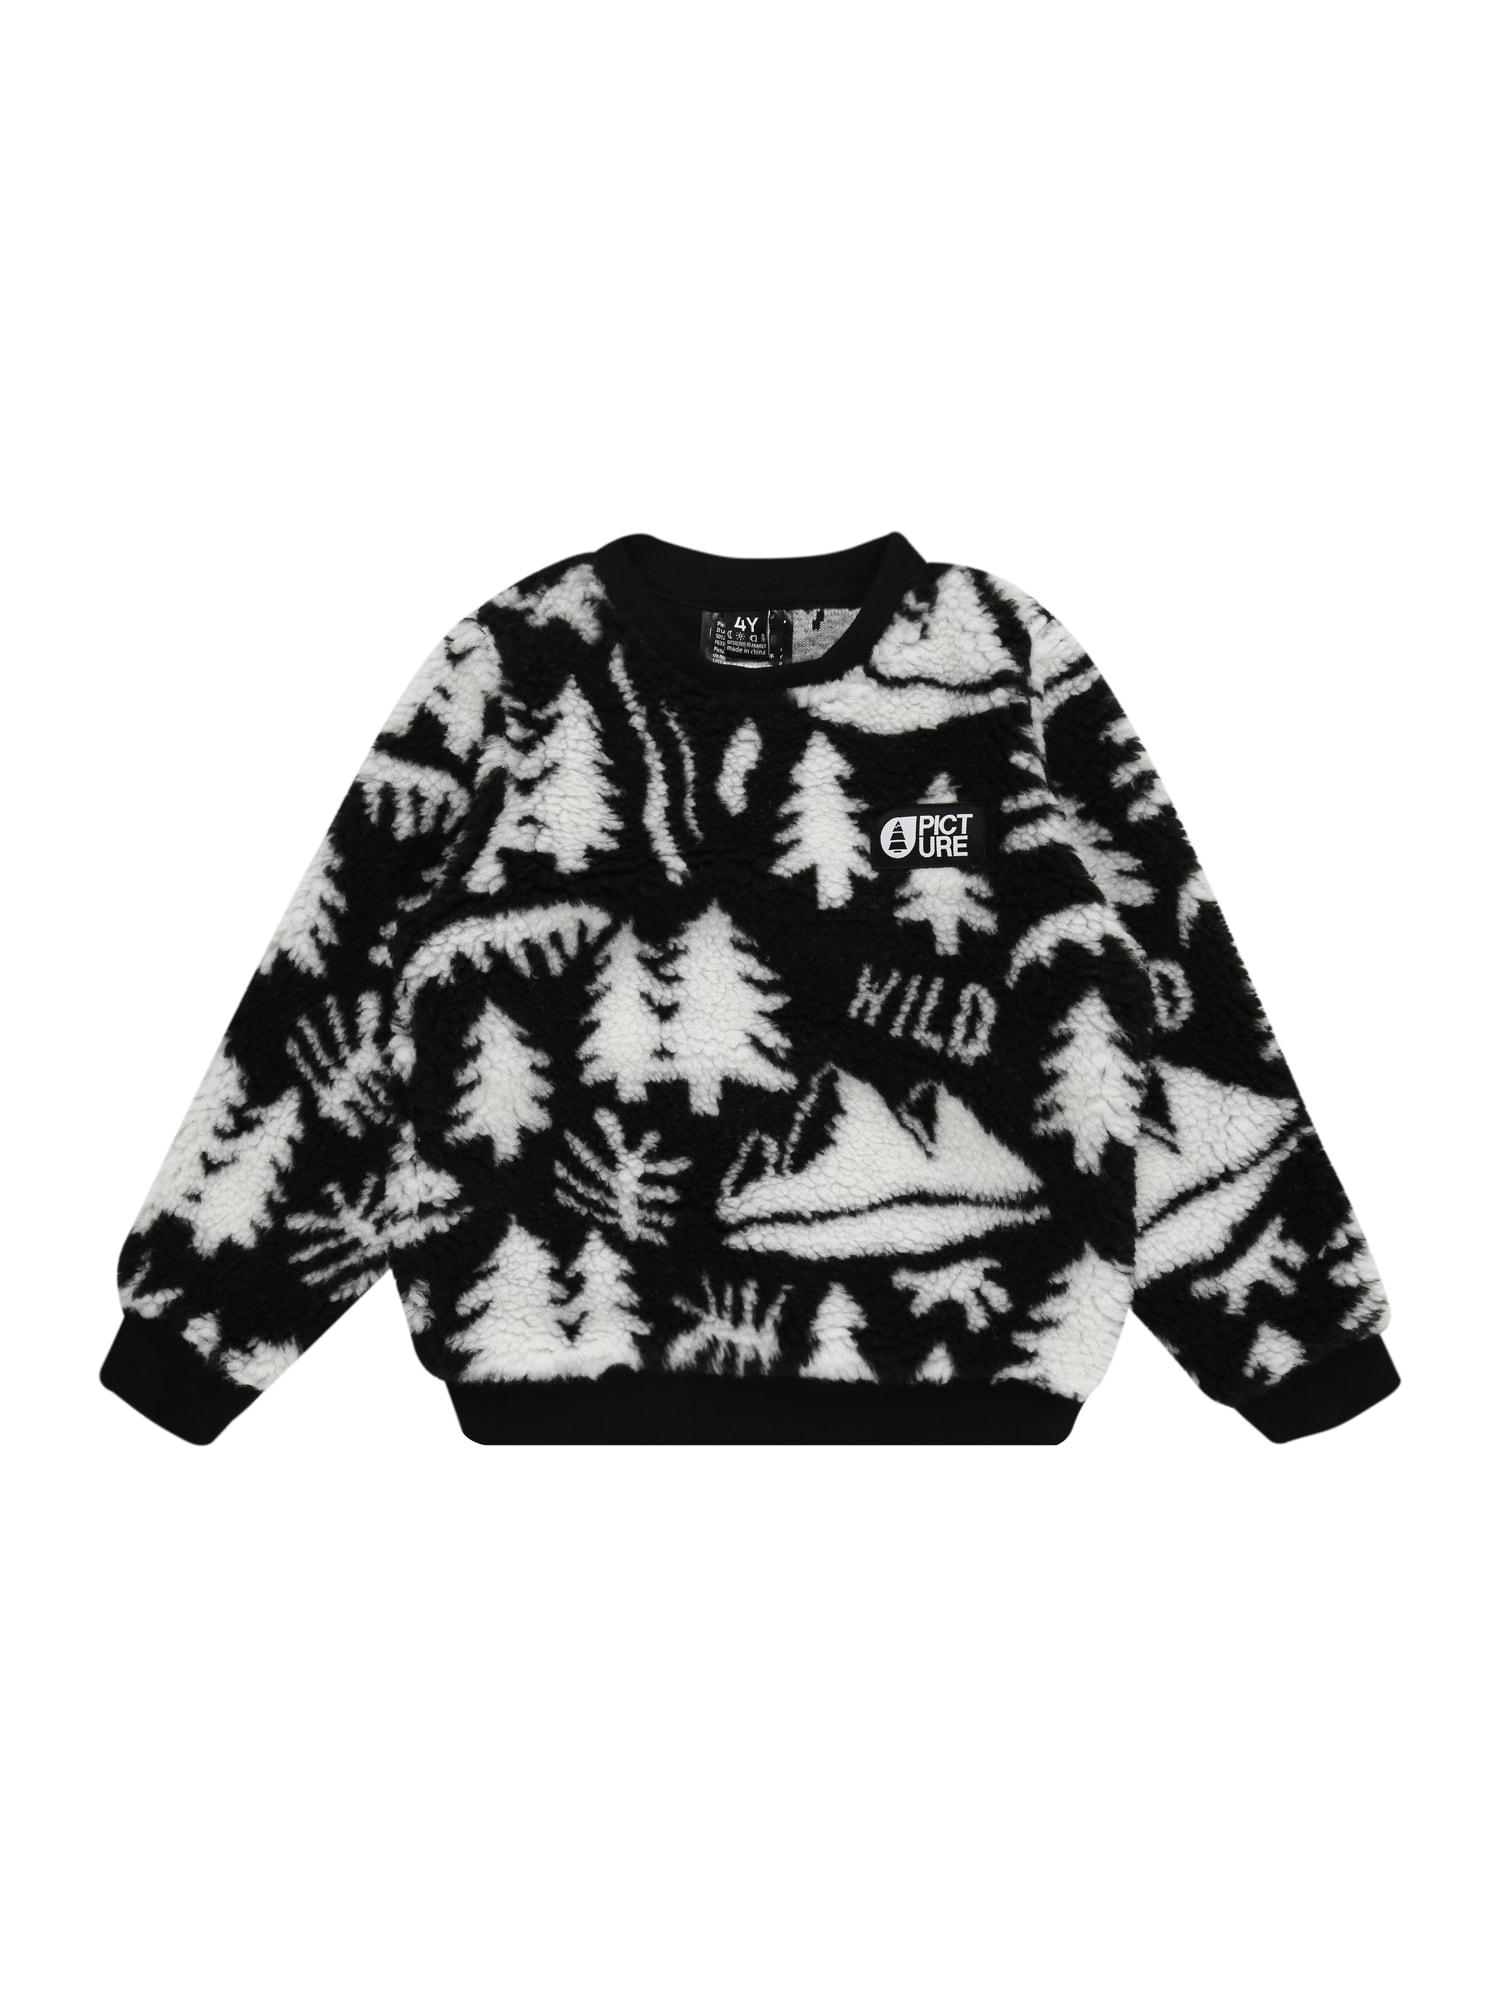 Picture Organic Clothing Sportinis megztinis